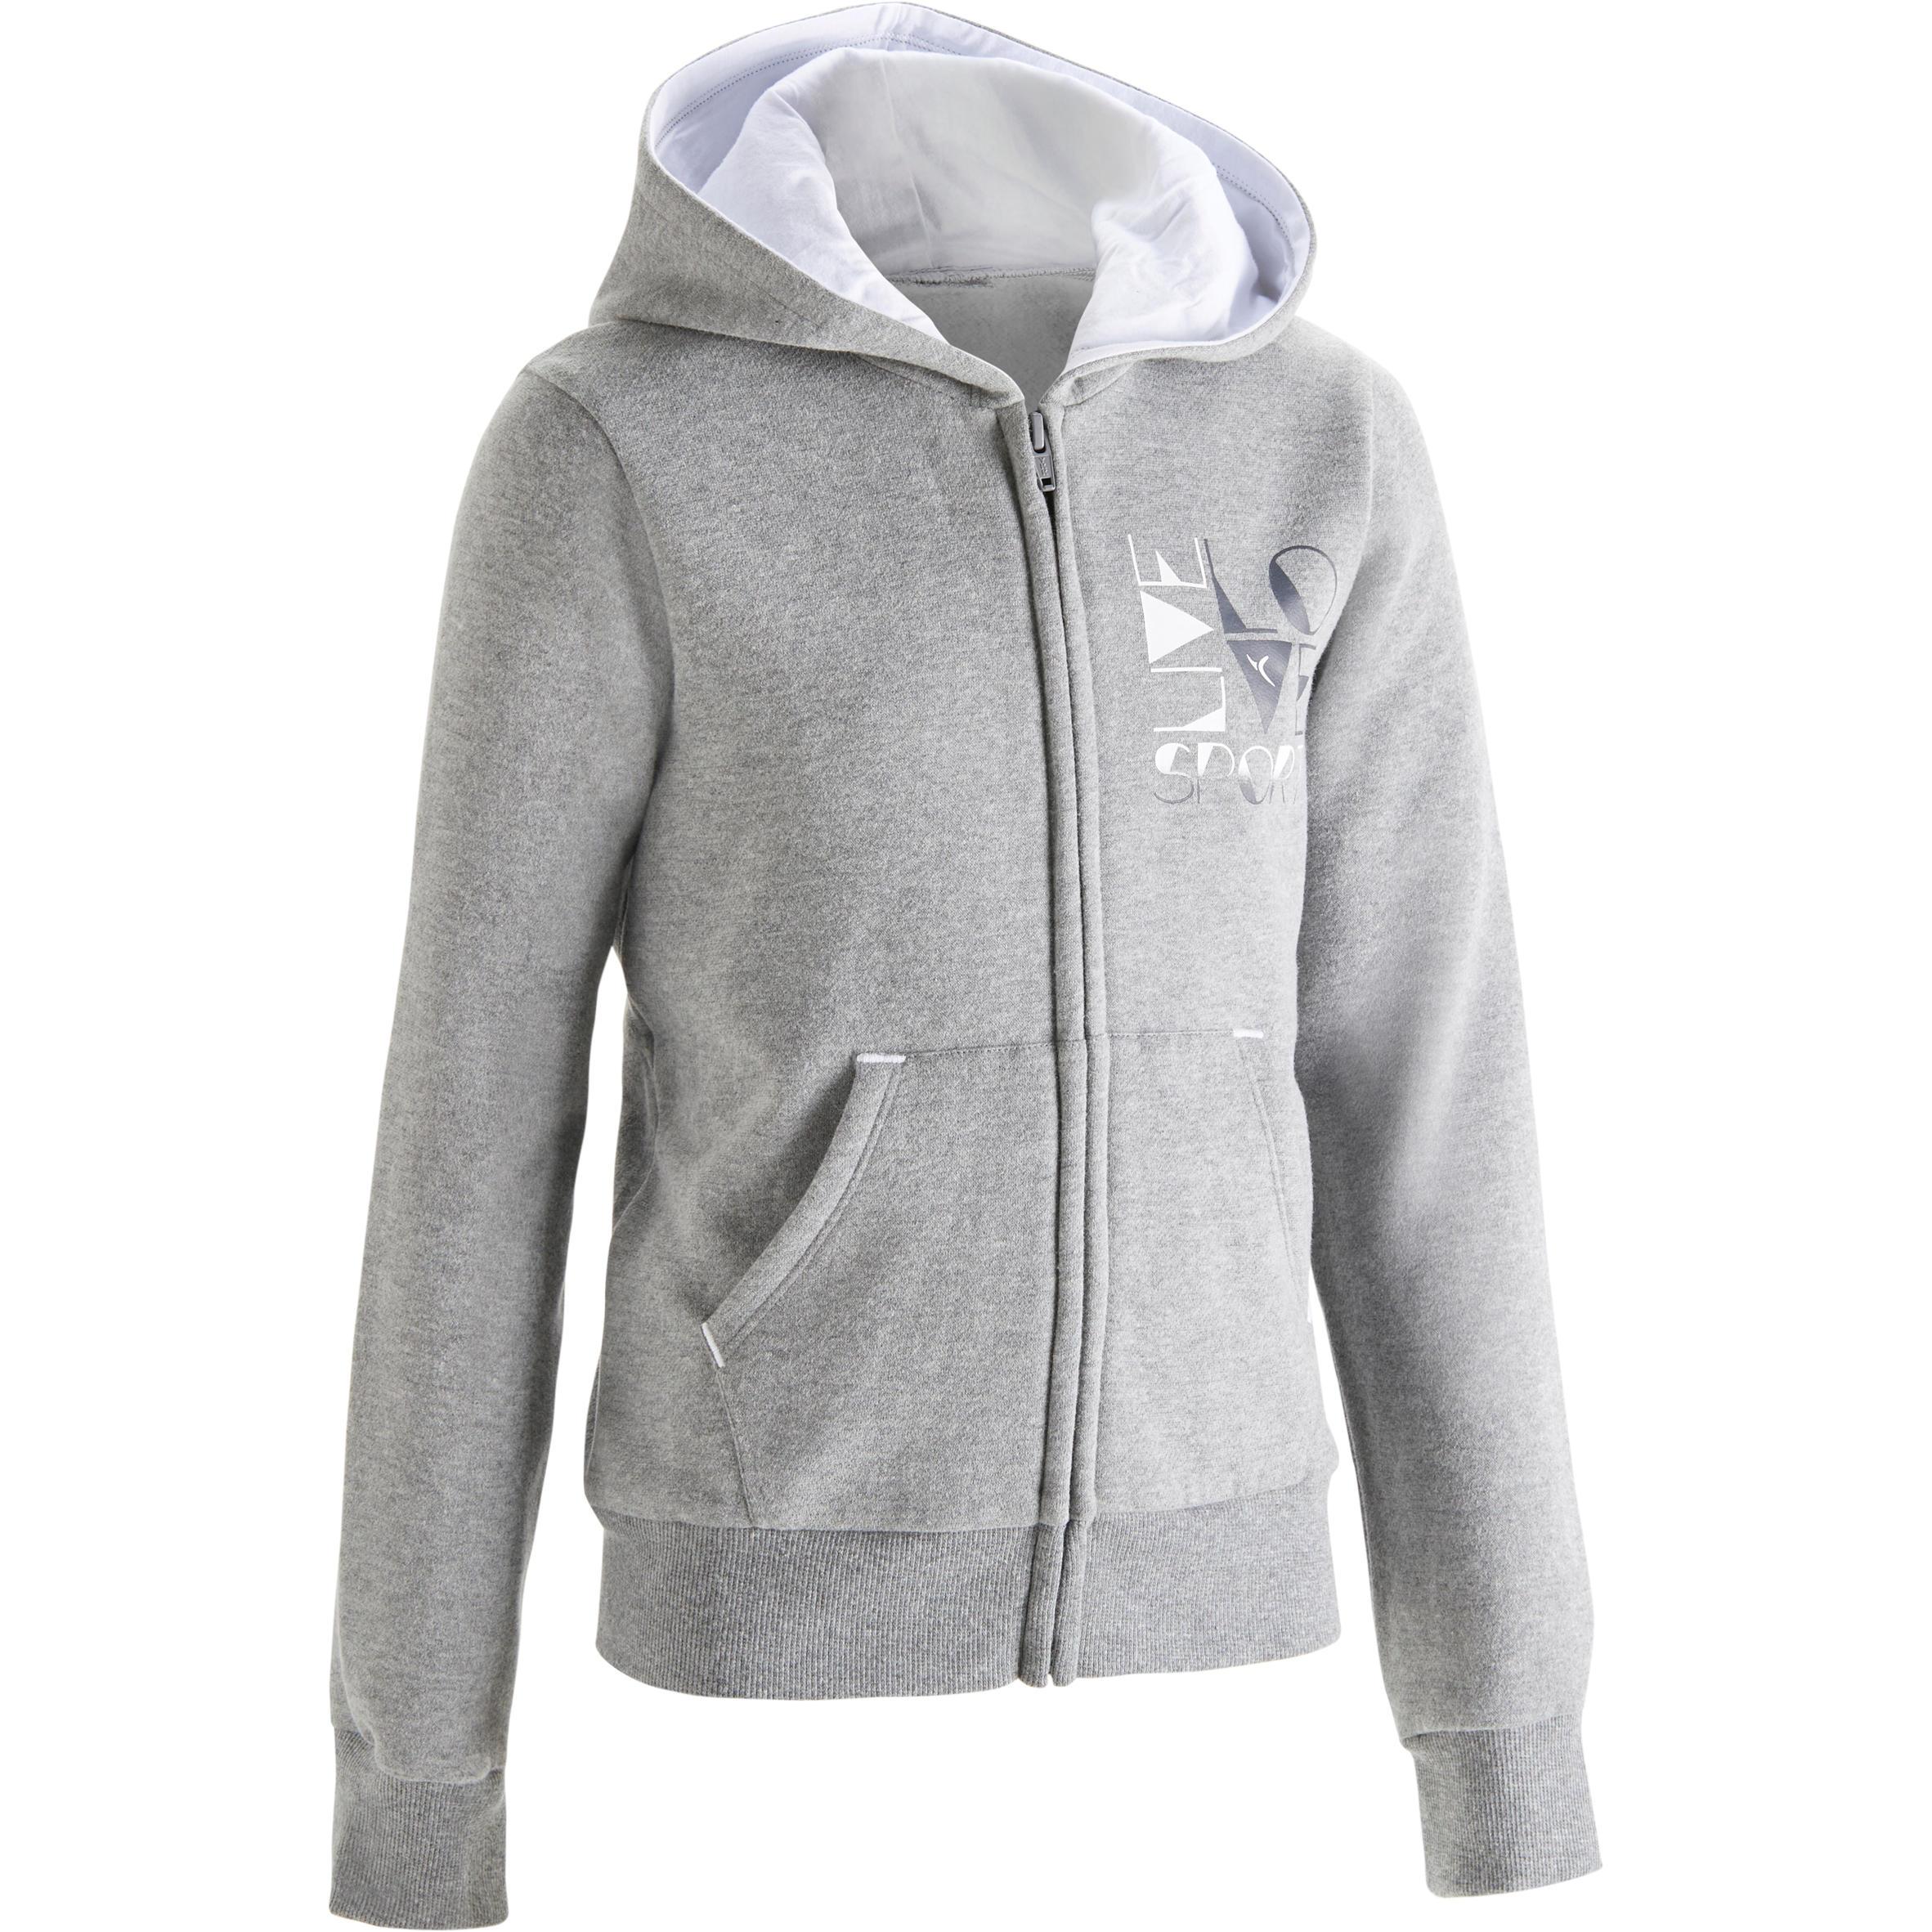 500 Girls Brushed Jersey Gym Jacket Grey